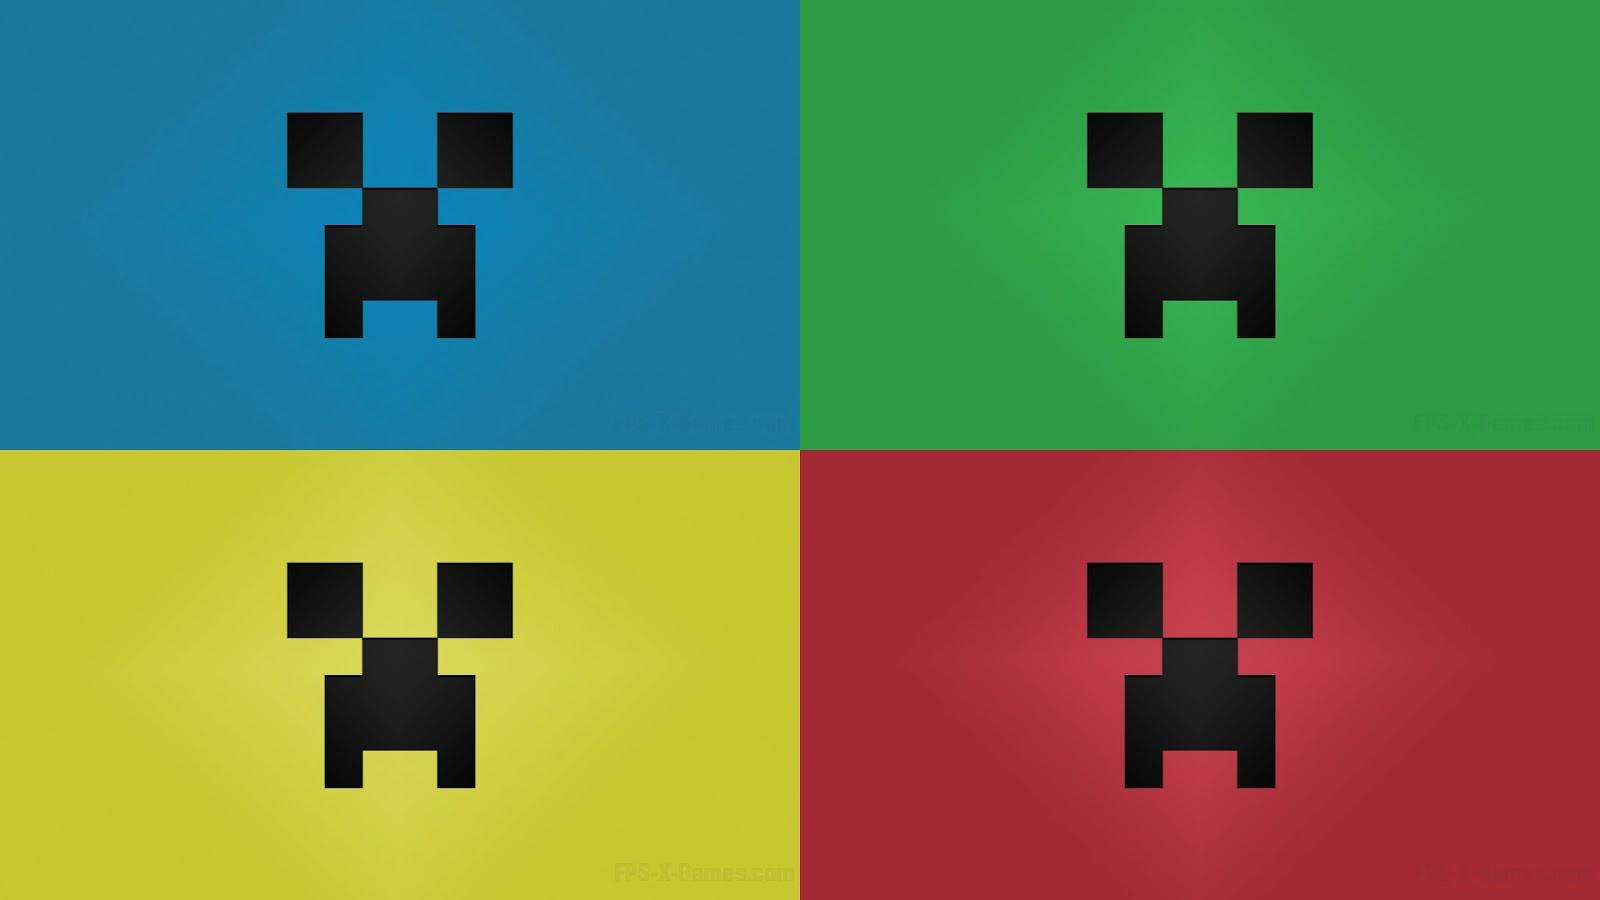 Big 3d Wallpapers For Desktop Primary Colors Minecraft Creeper Desktop Wallpaper Large